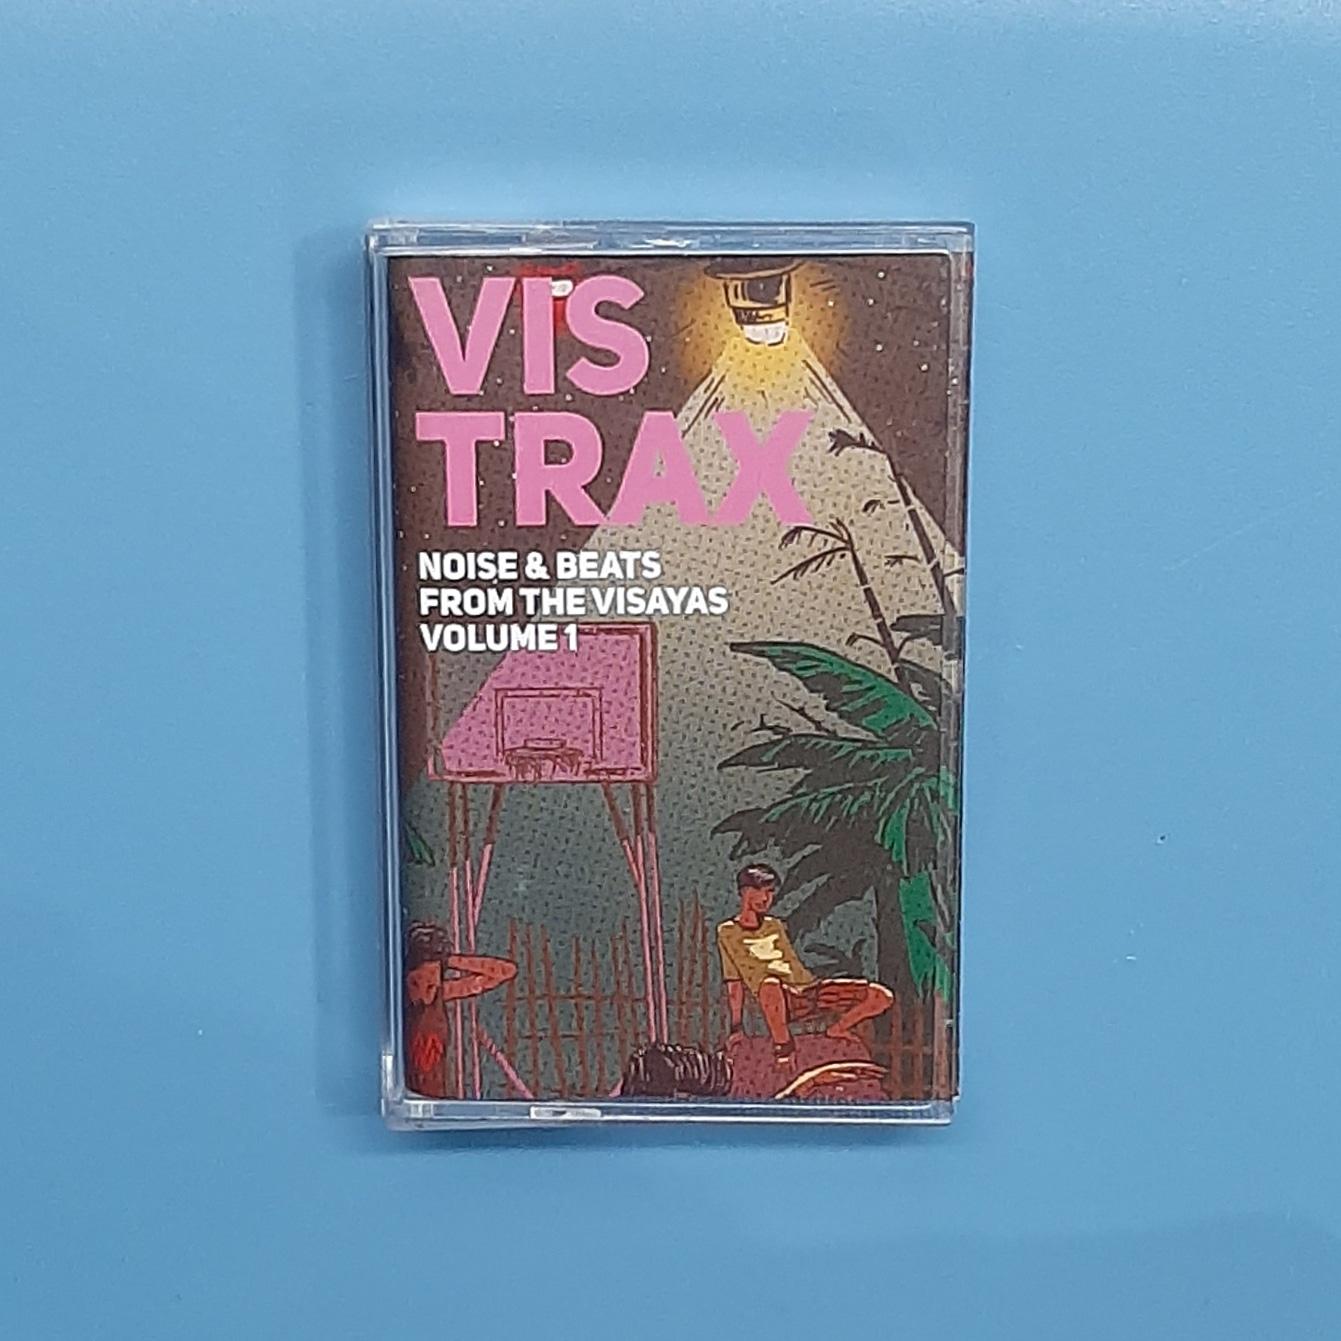 VIS TRAX Vol. 1: Noise & Beats from the Visayas (PAWN Records / Green Papaya Art Projects)